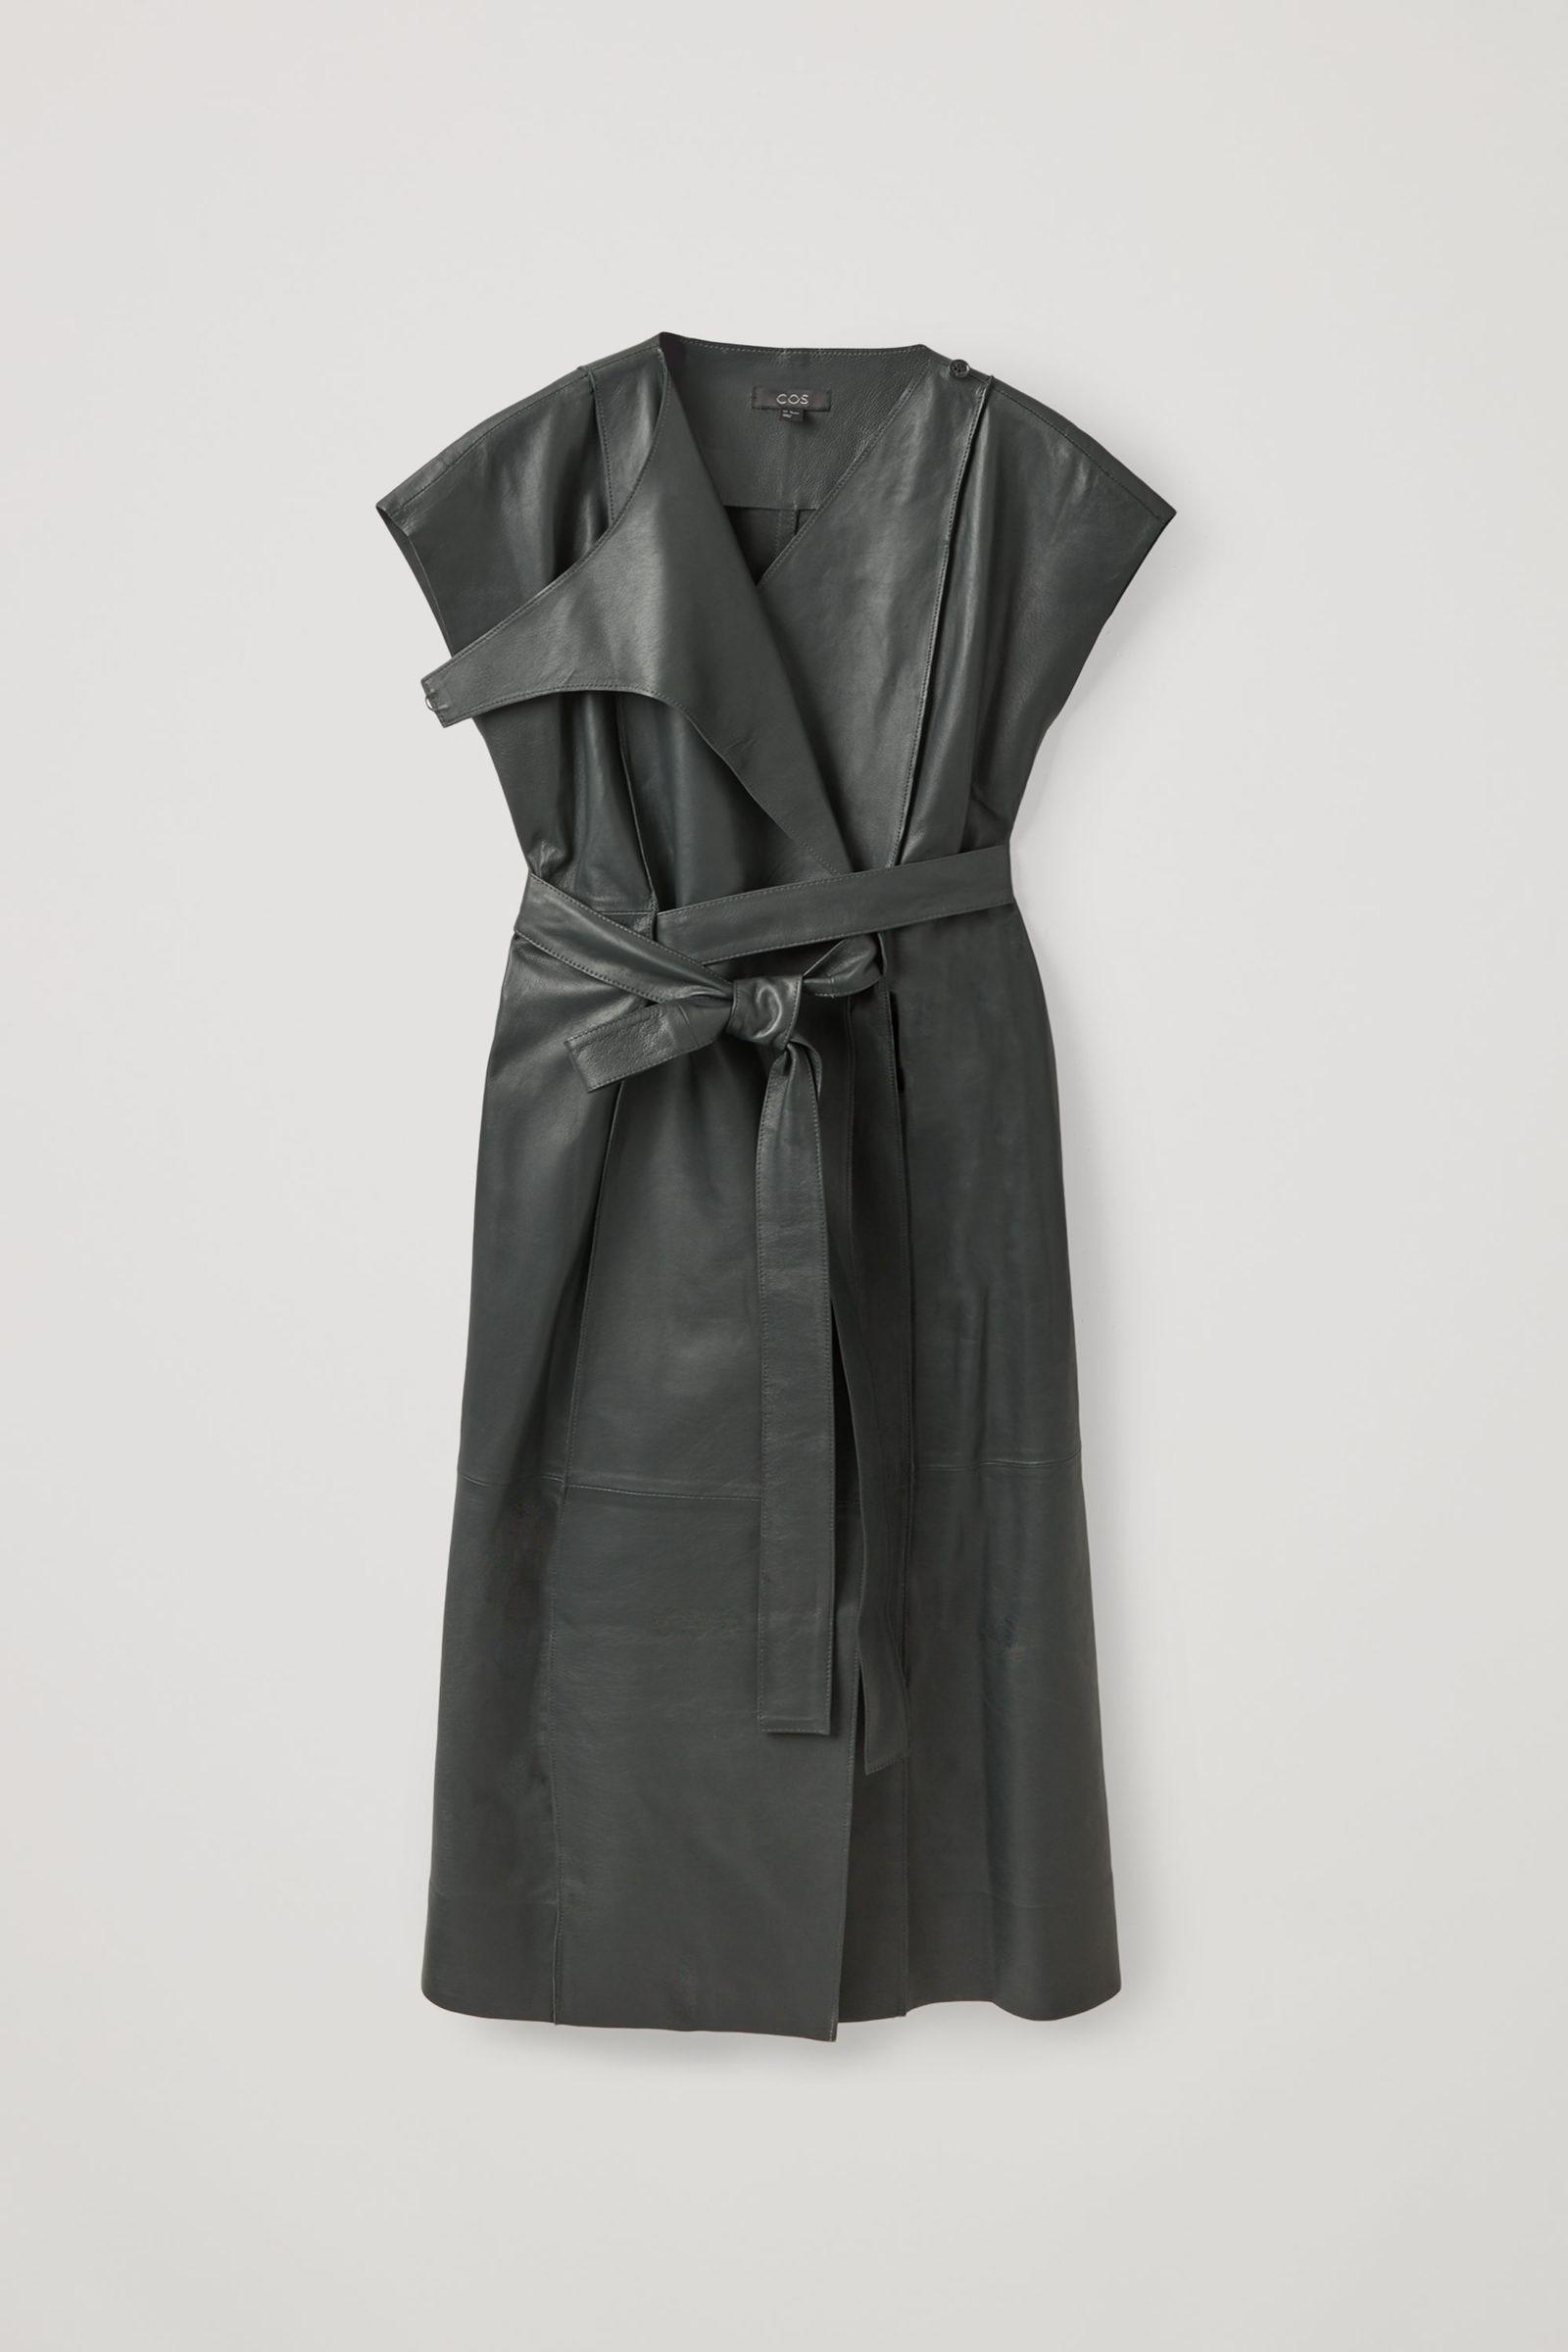 COS 벨티드 레더 드레스의 다크 그레이컬러 Product입니다.